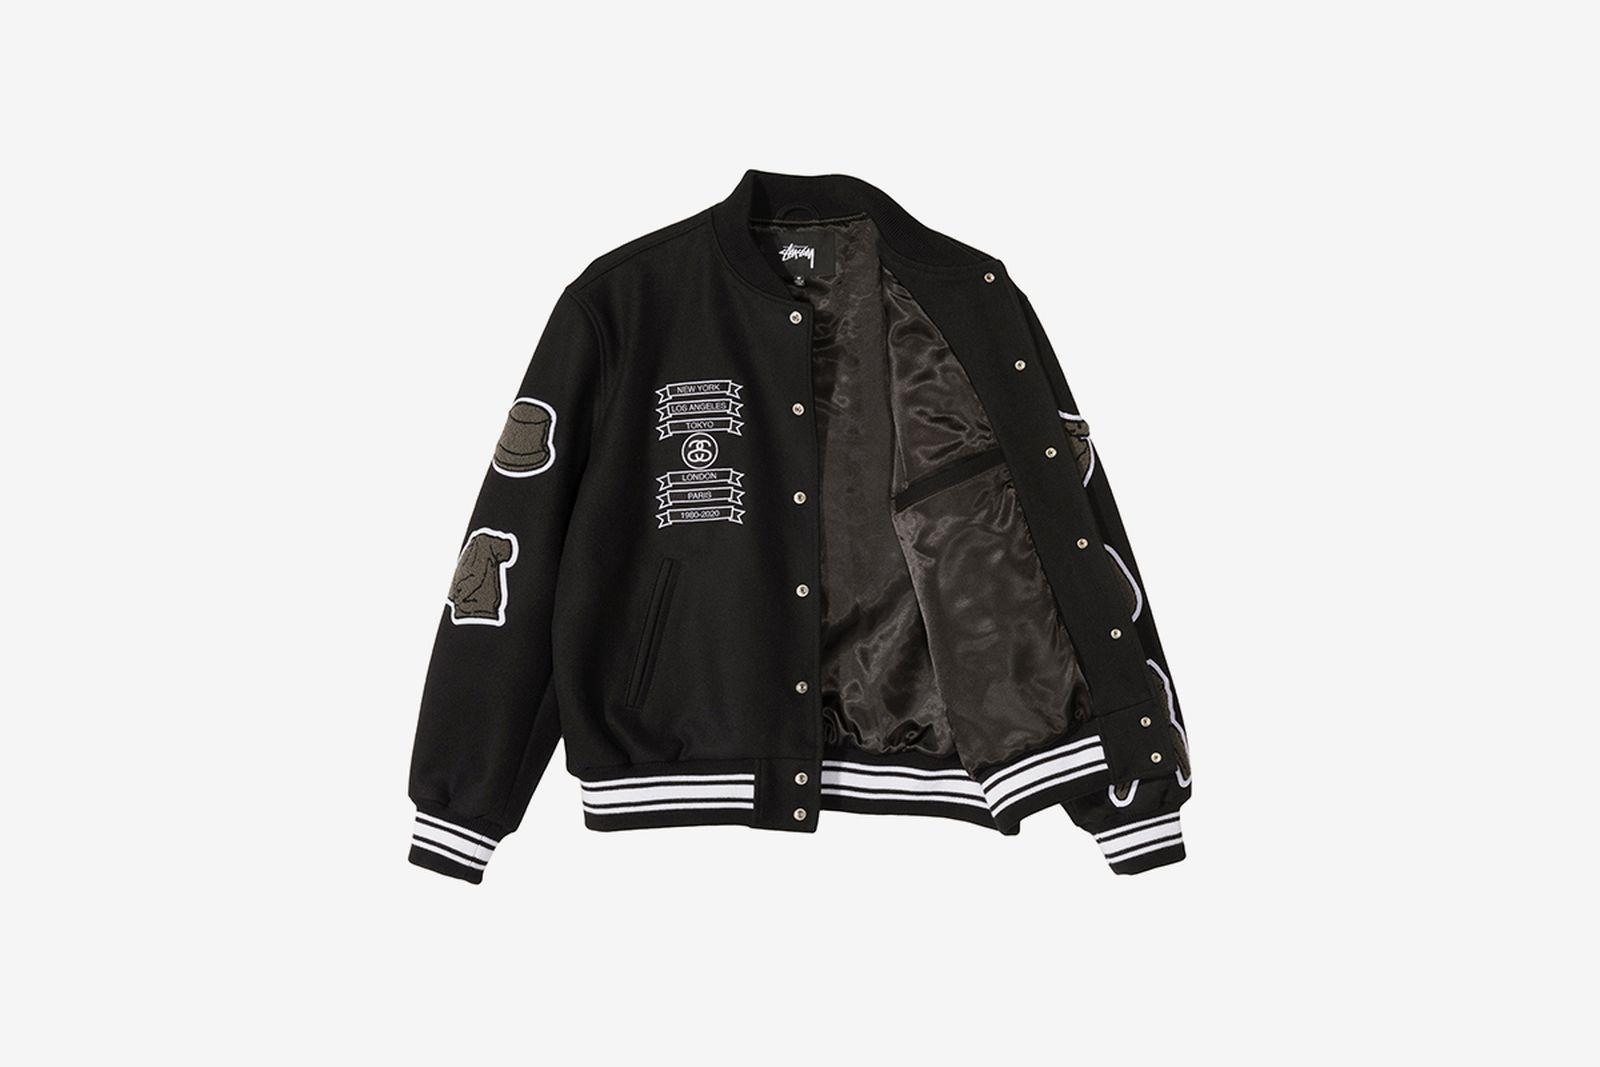 stussy-comme-des-garcons-varsity-jacket-1-02